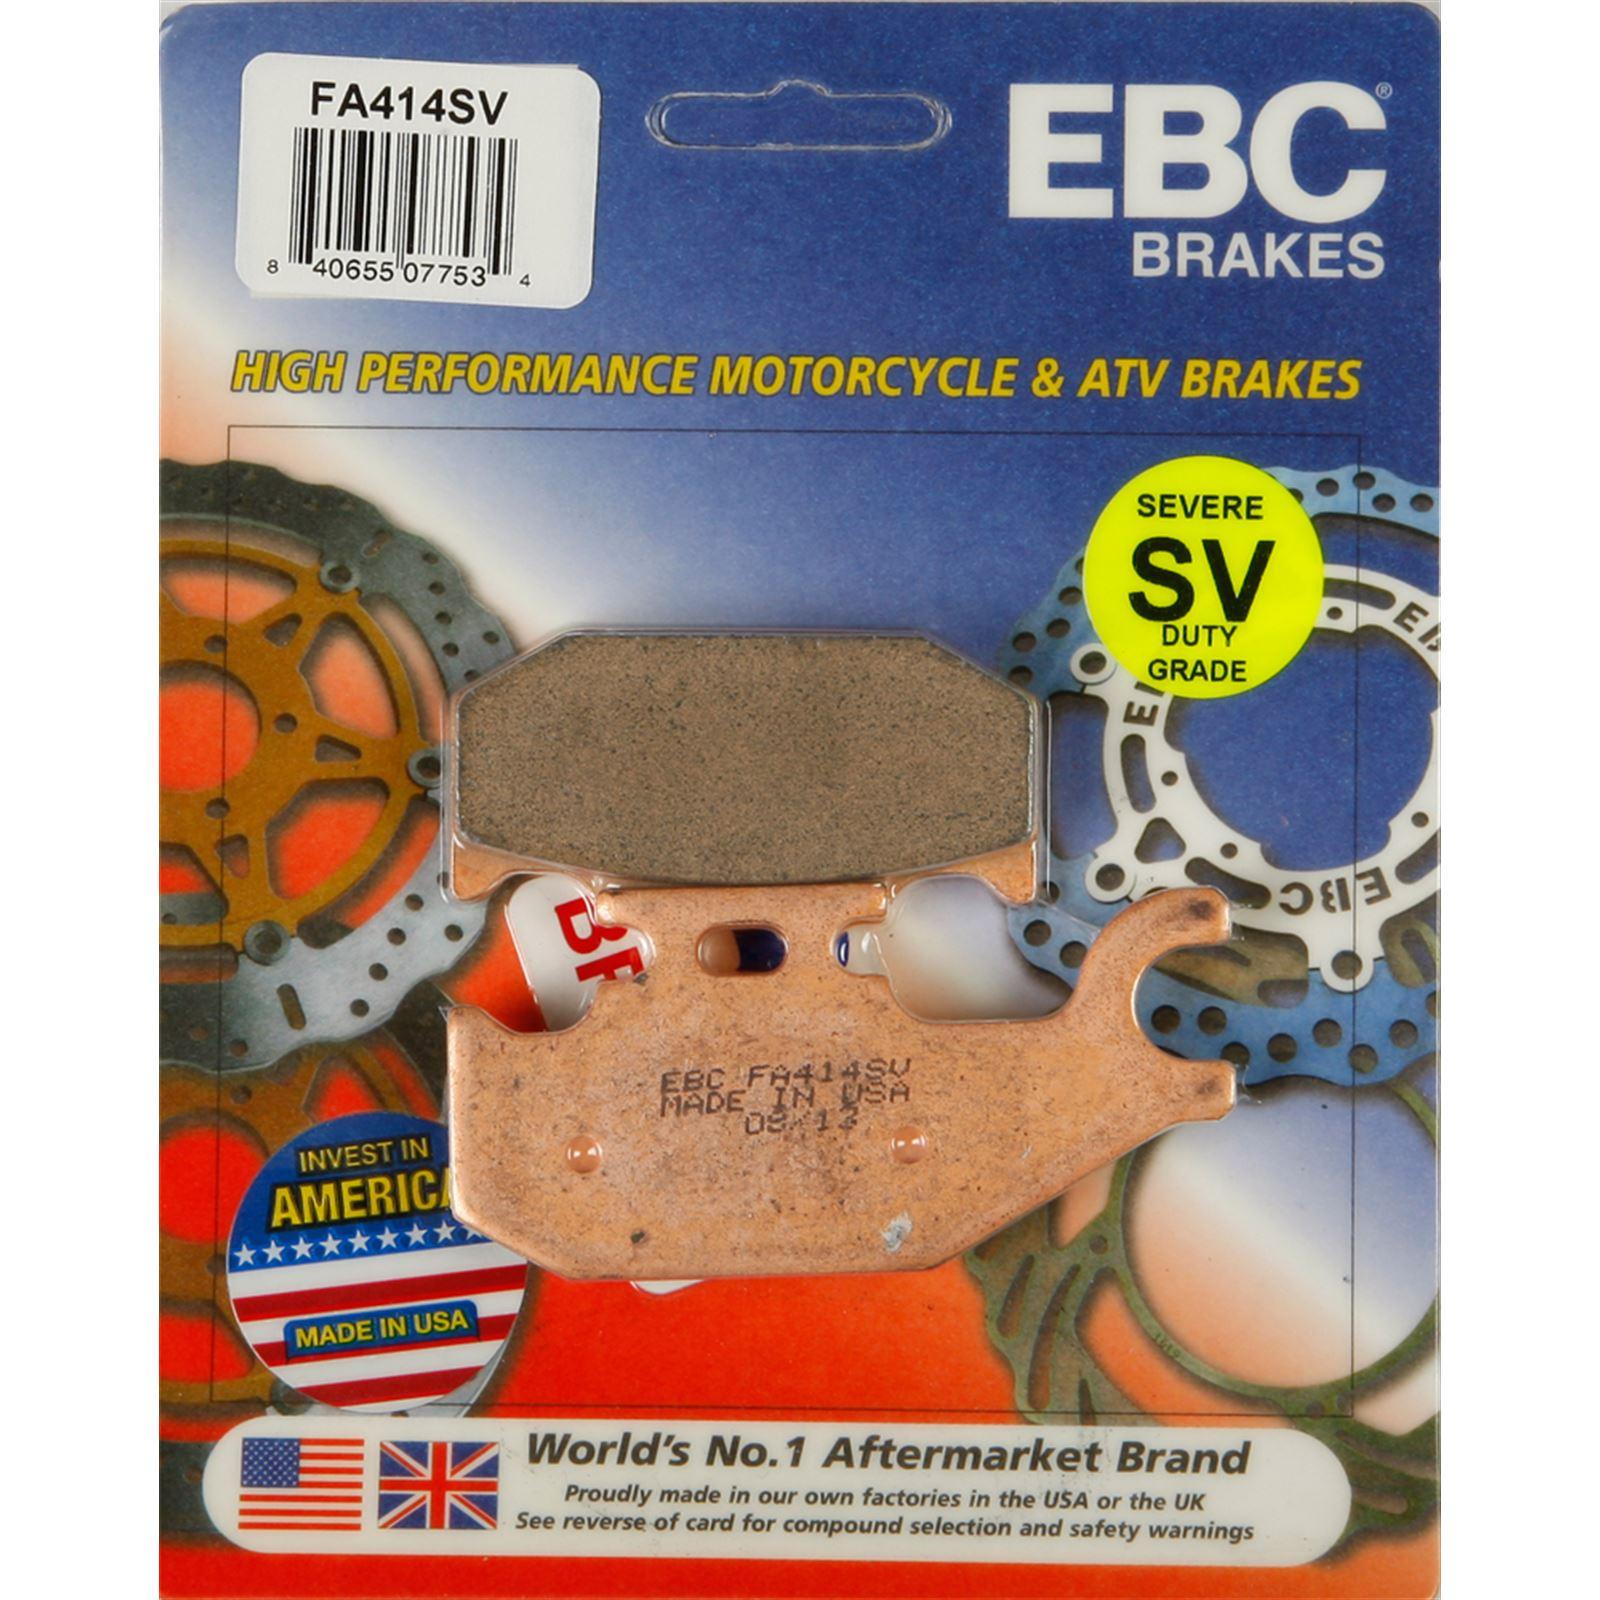 EBC Severe Duty Brake Pads